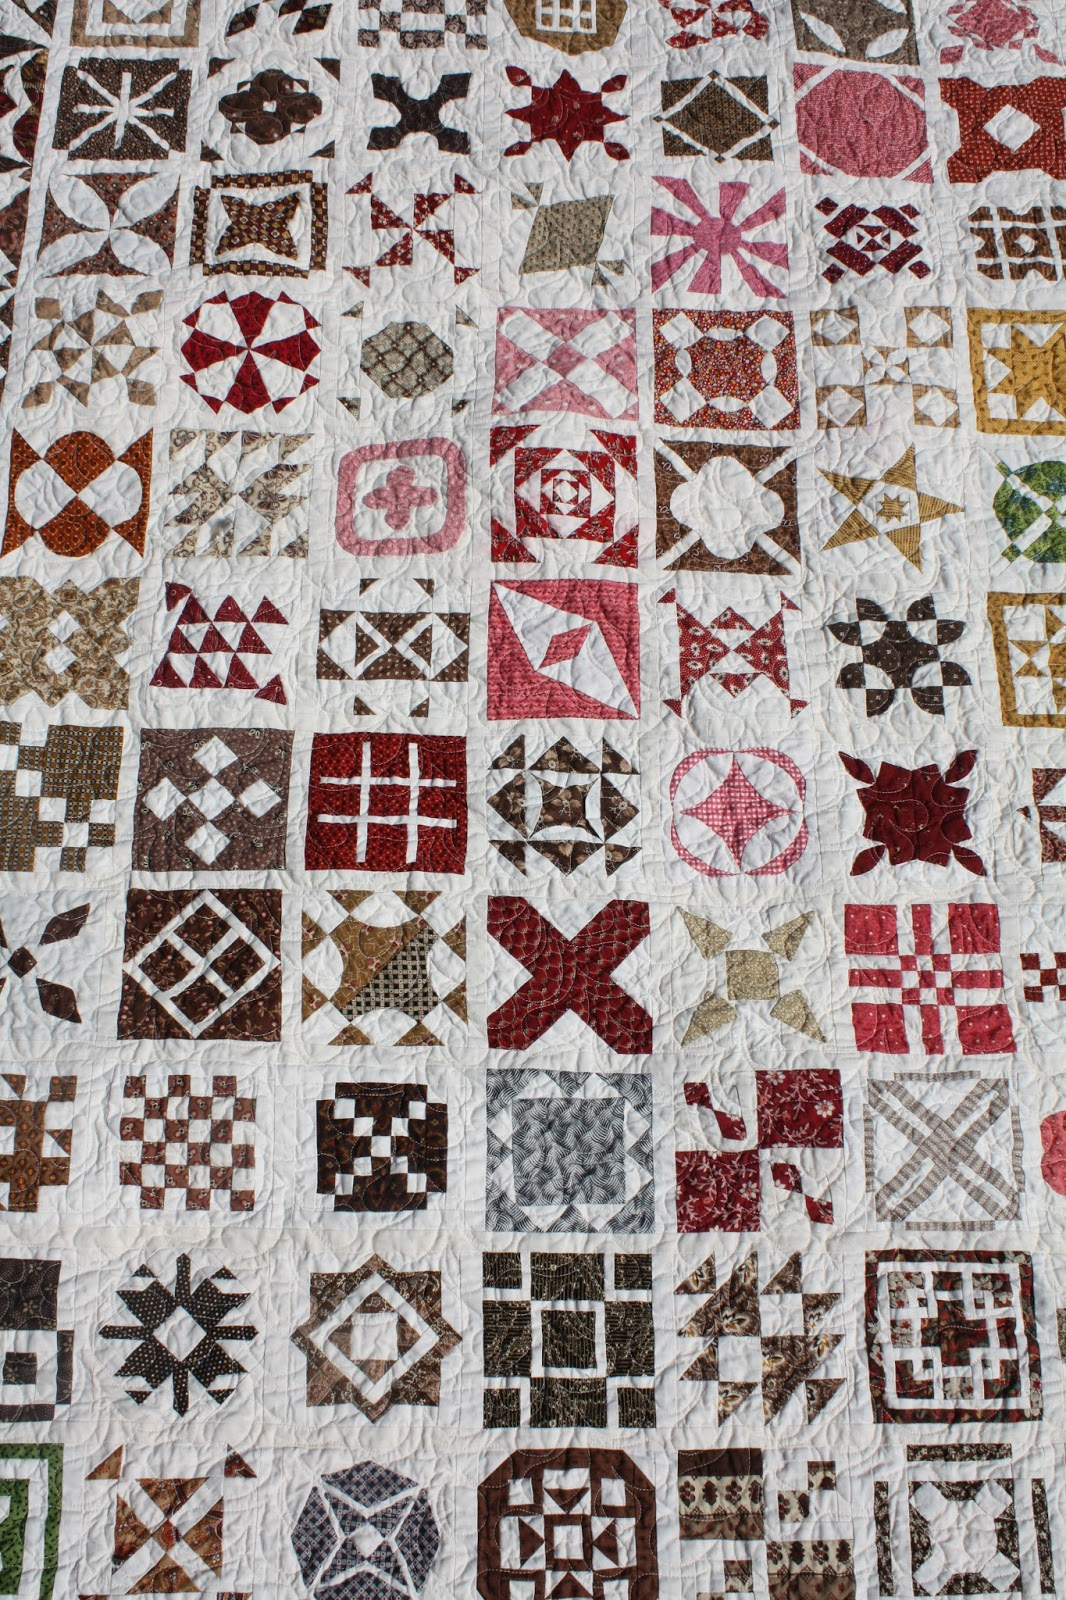 Temecula Quilt Company: Dear Jane Journal : temecula quilt company - Adamdwight.com